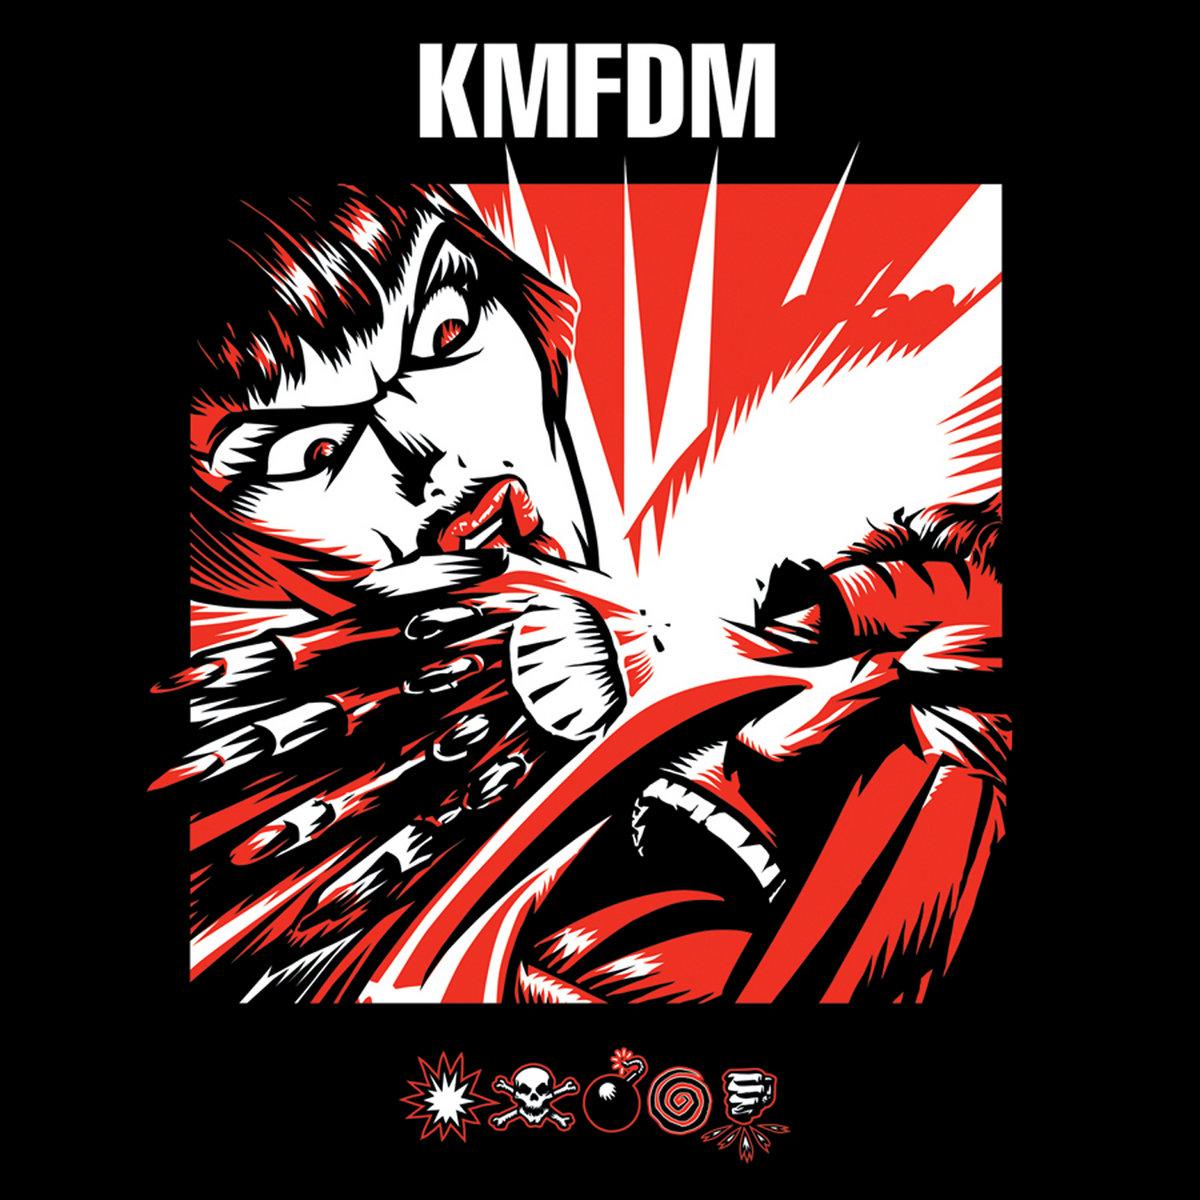 Symbols Kmfdm